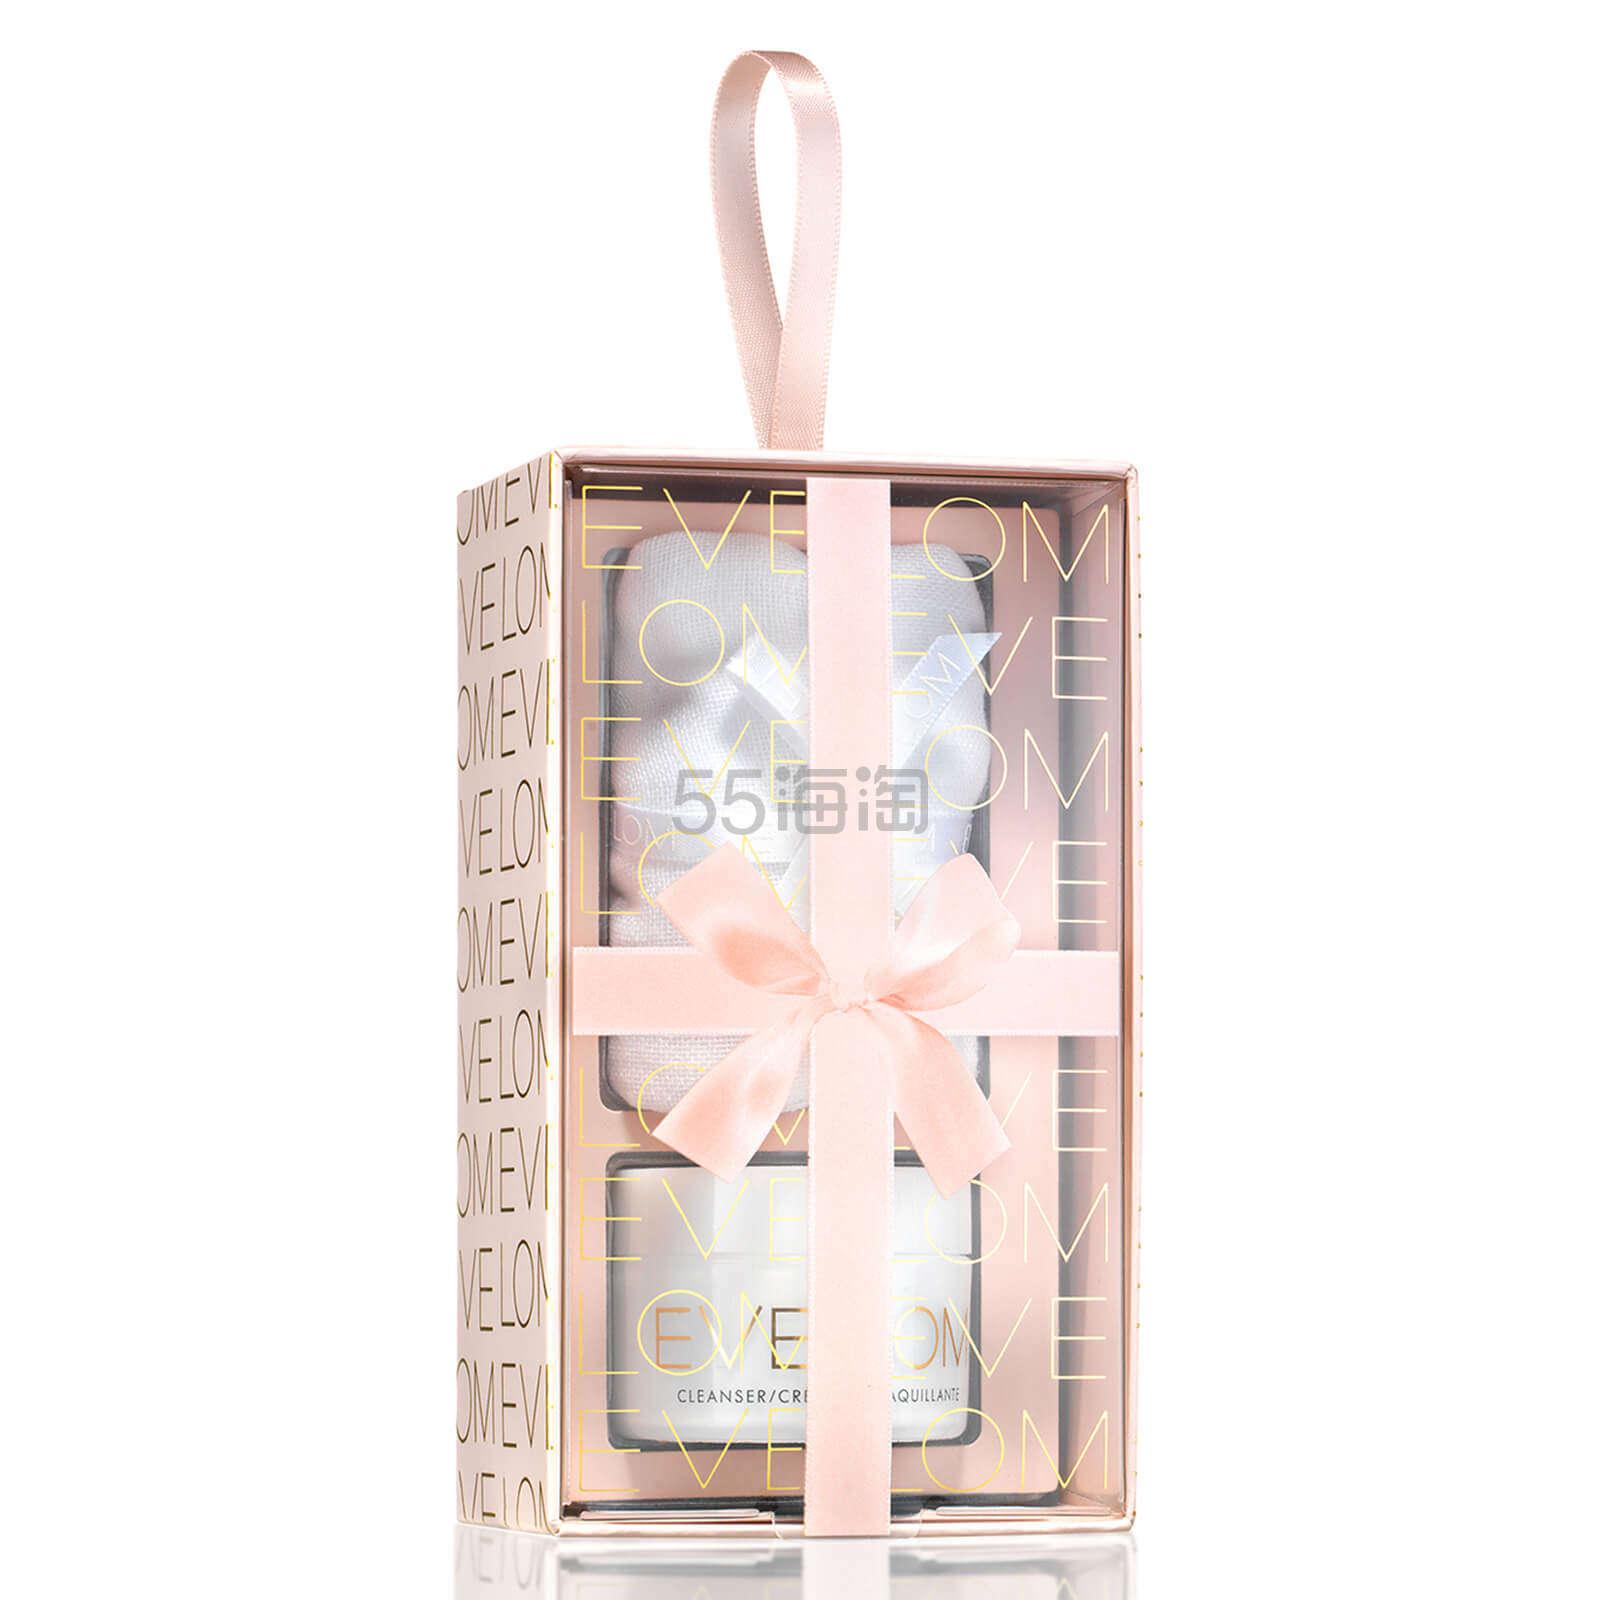 Eve Lom 迷你卸妆膏圣诞套装 附洁面巾 20ml